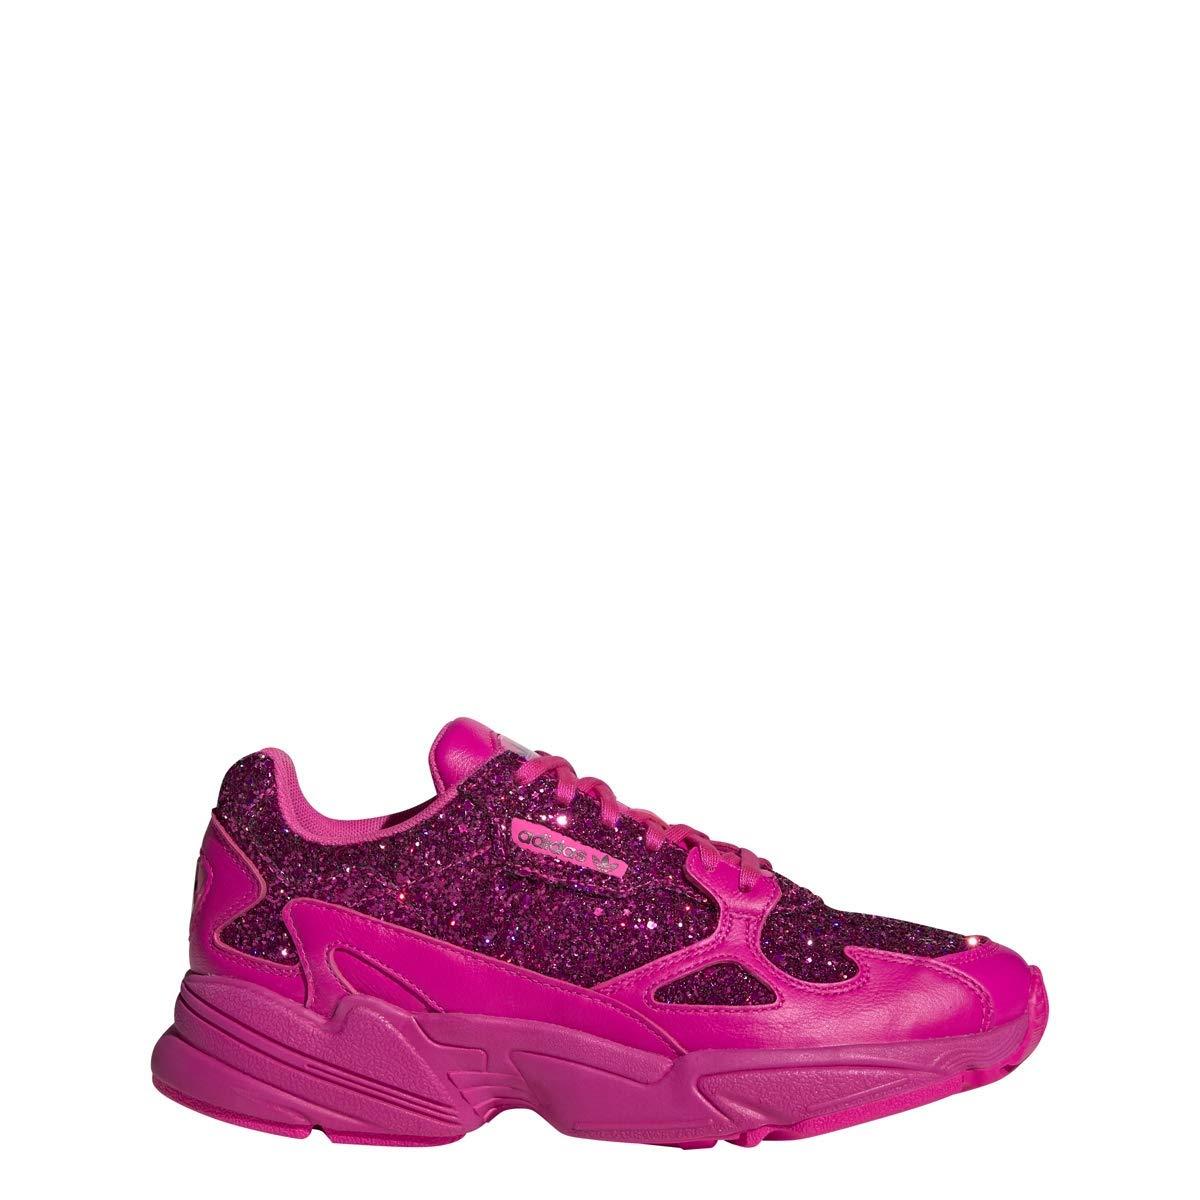 adidas Originals Falcon Shoe - Women's Casual